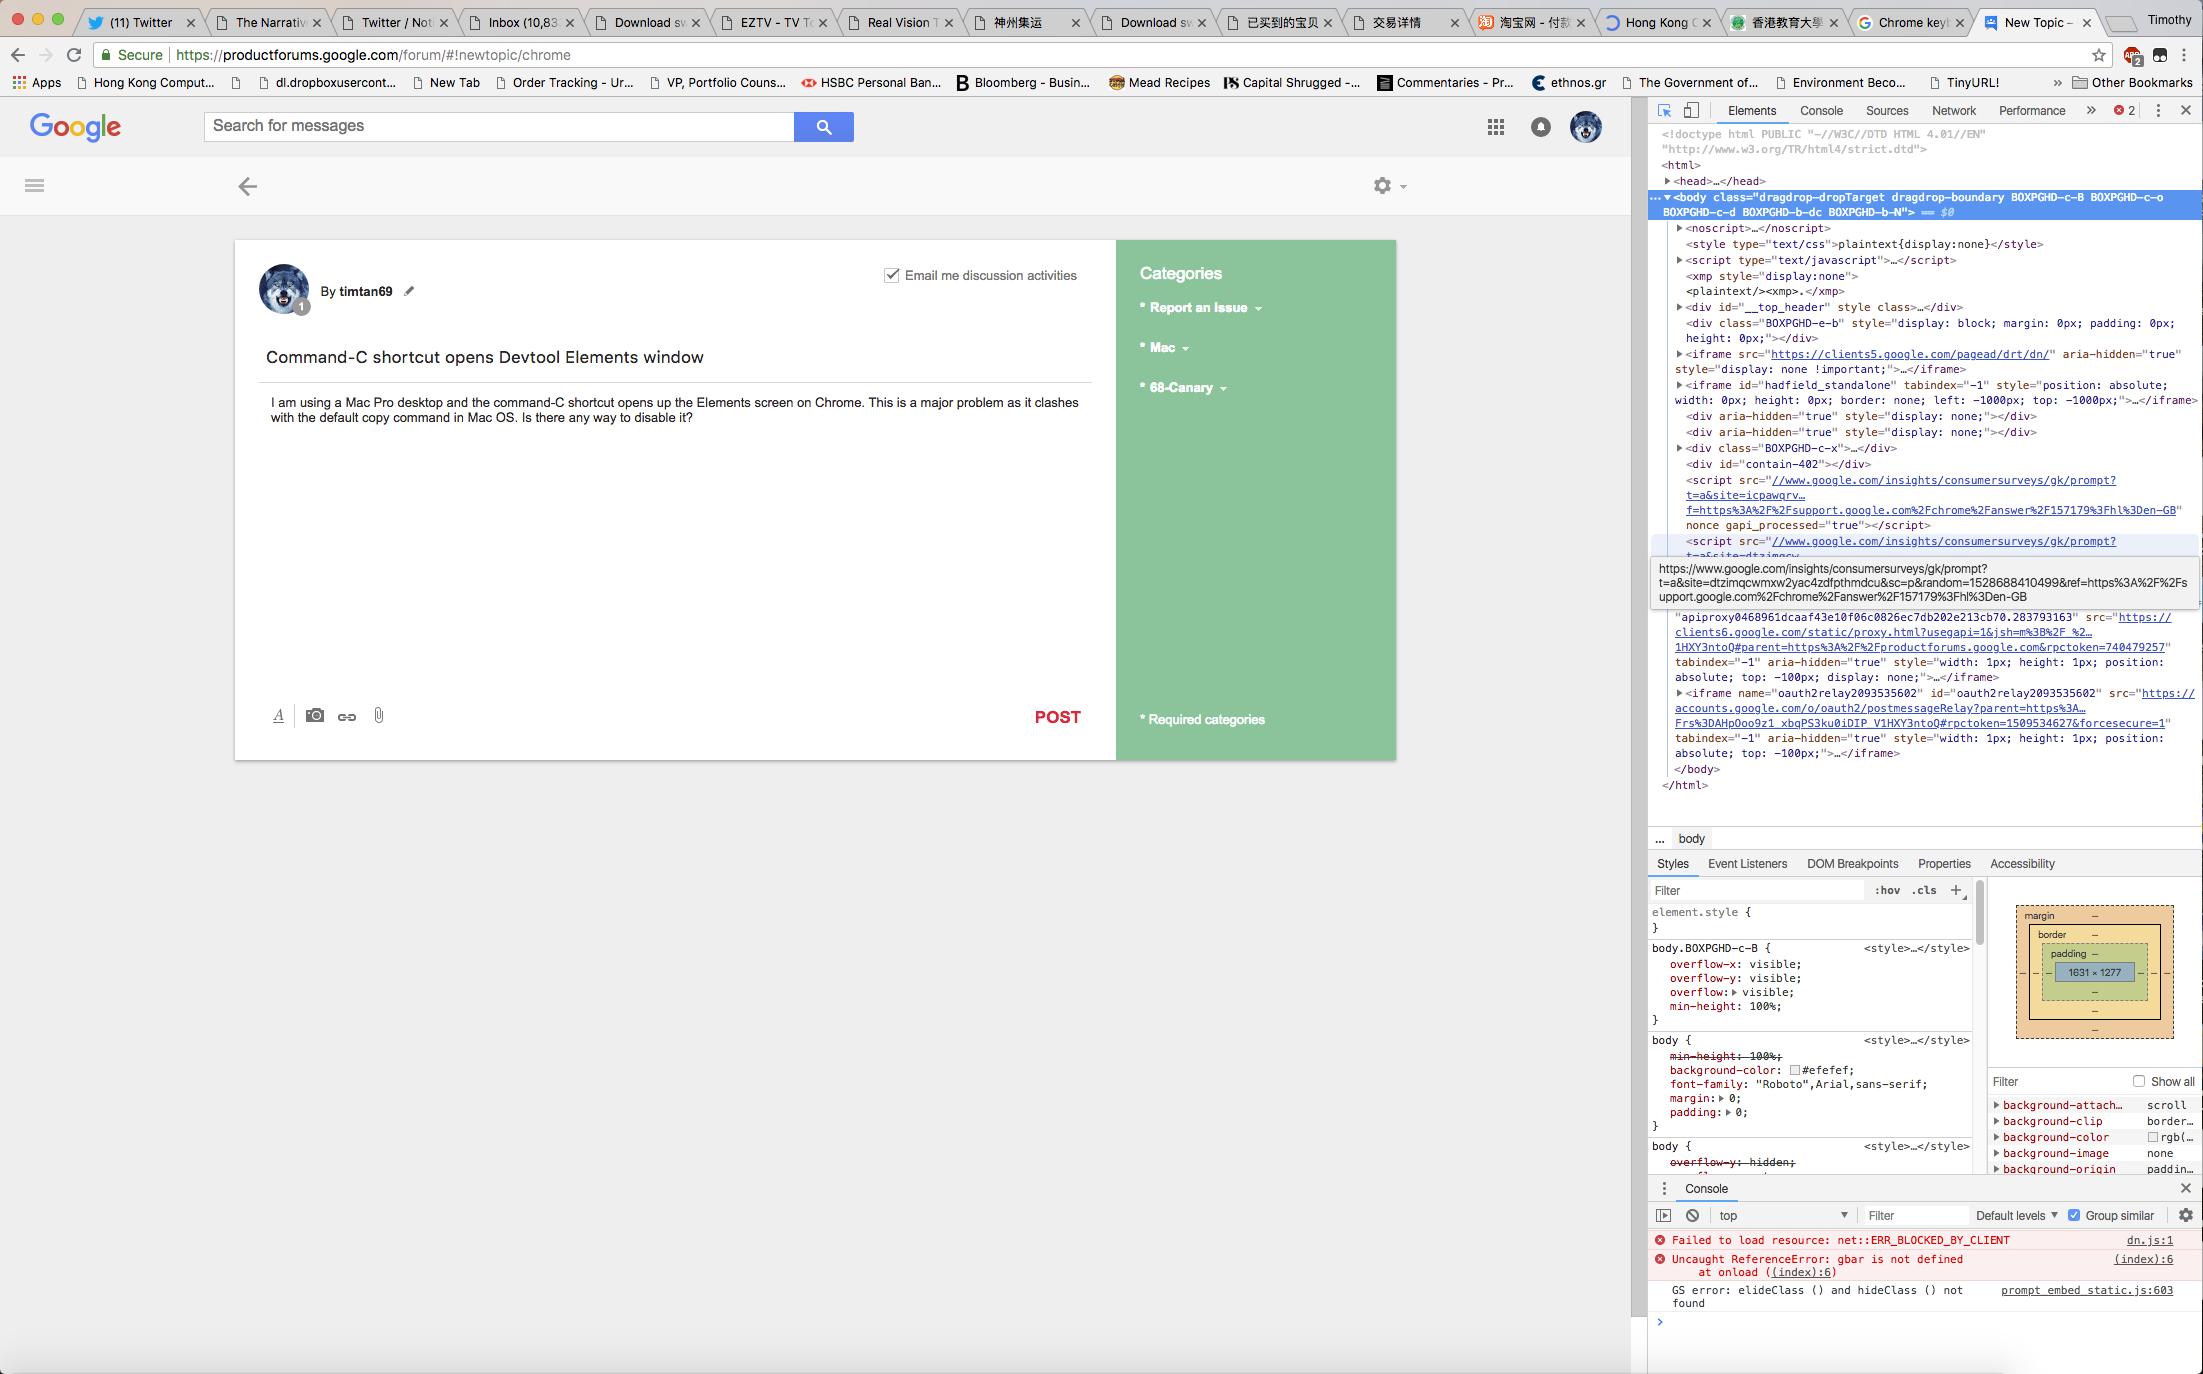 Command-C shortcut opens Devtool Elements window - Google